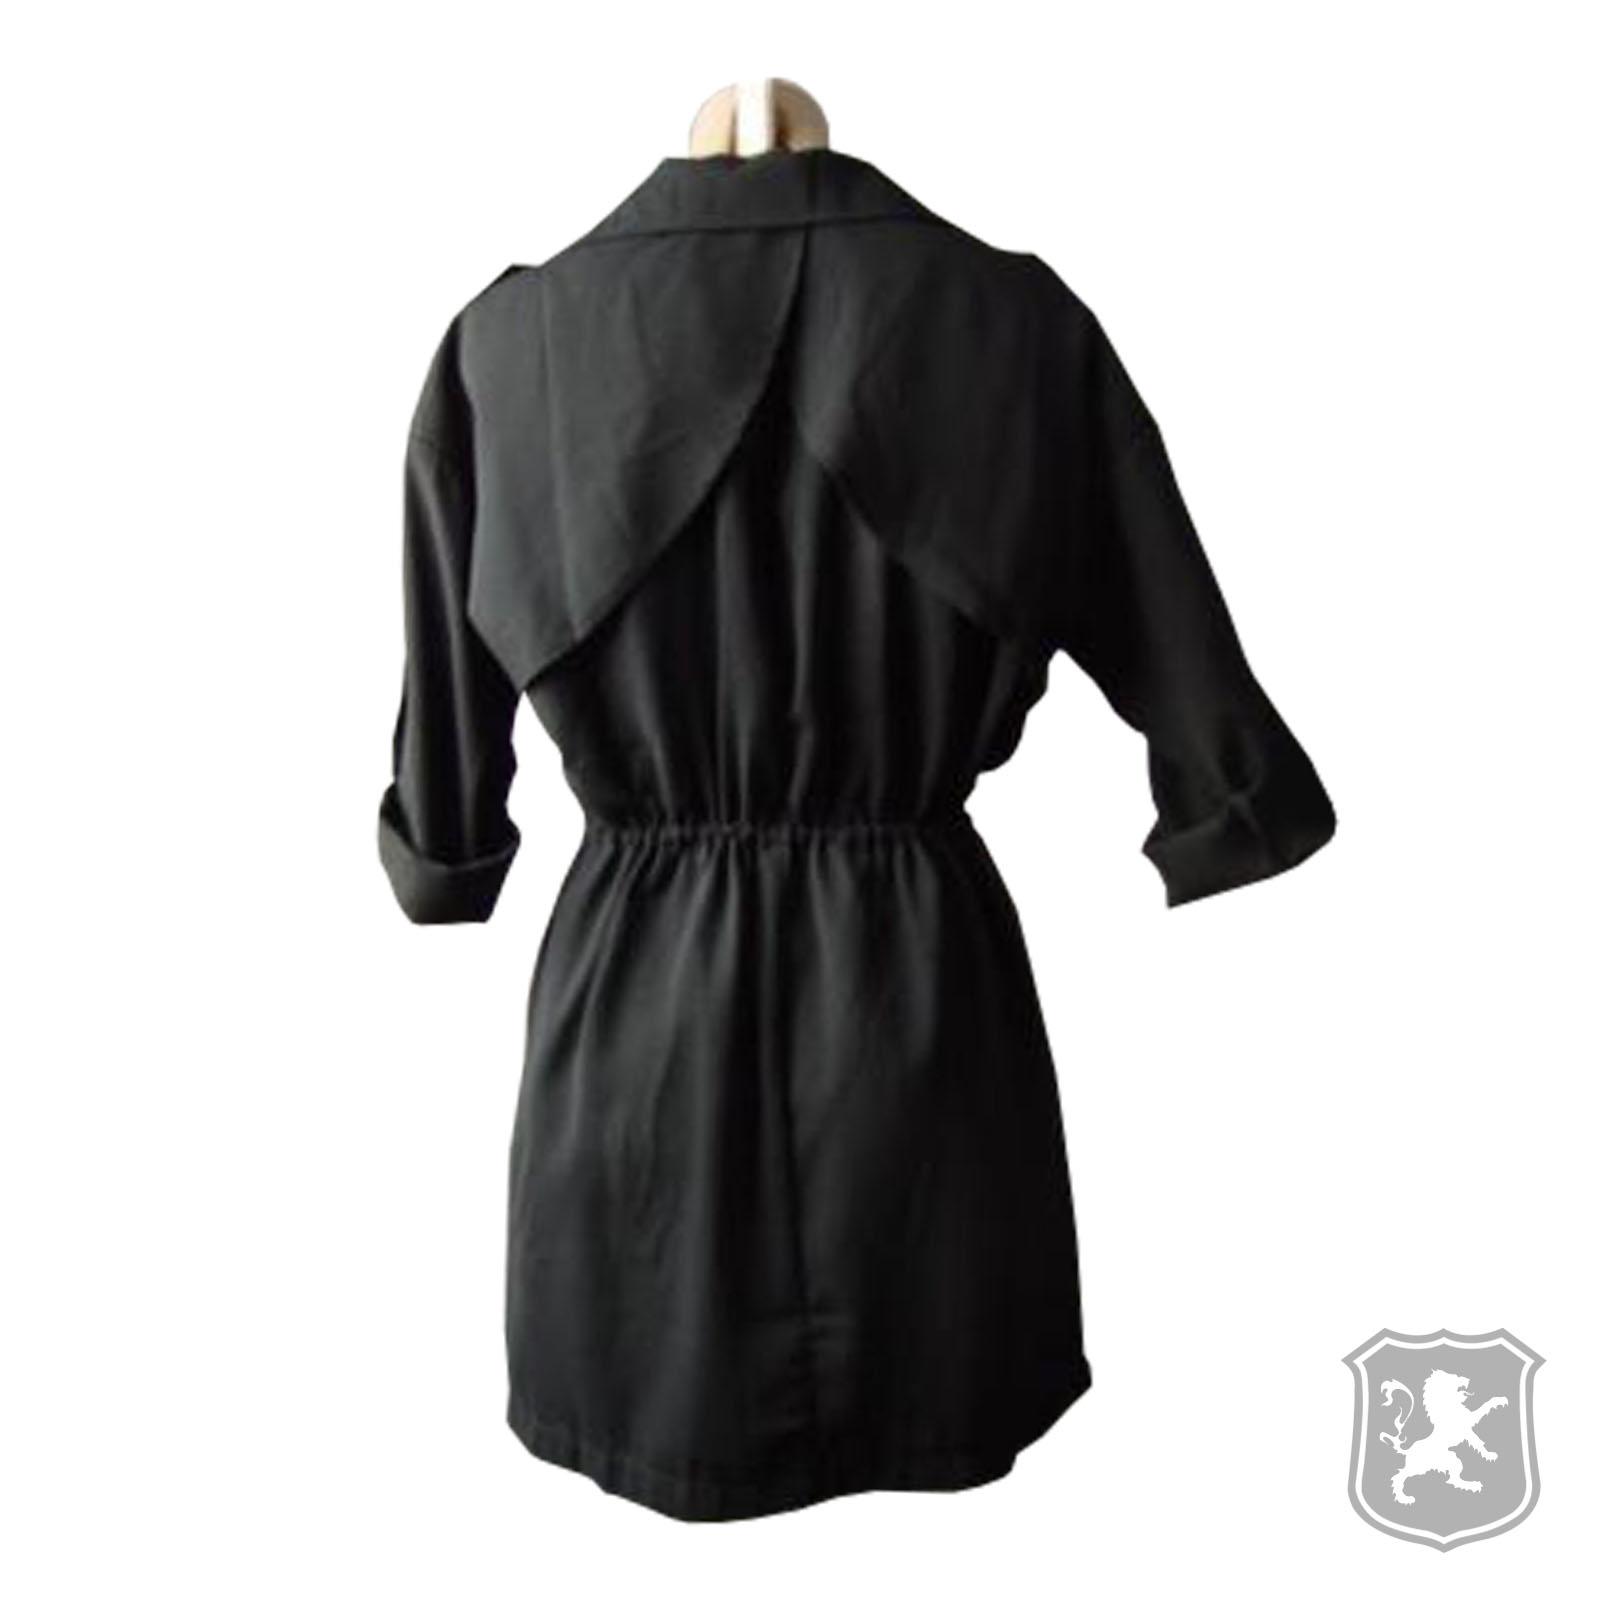 054360bb38e Black Victorian Military Jacket